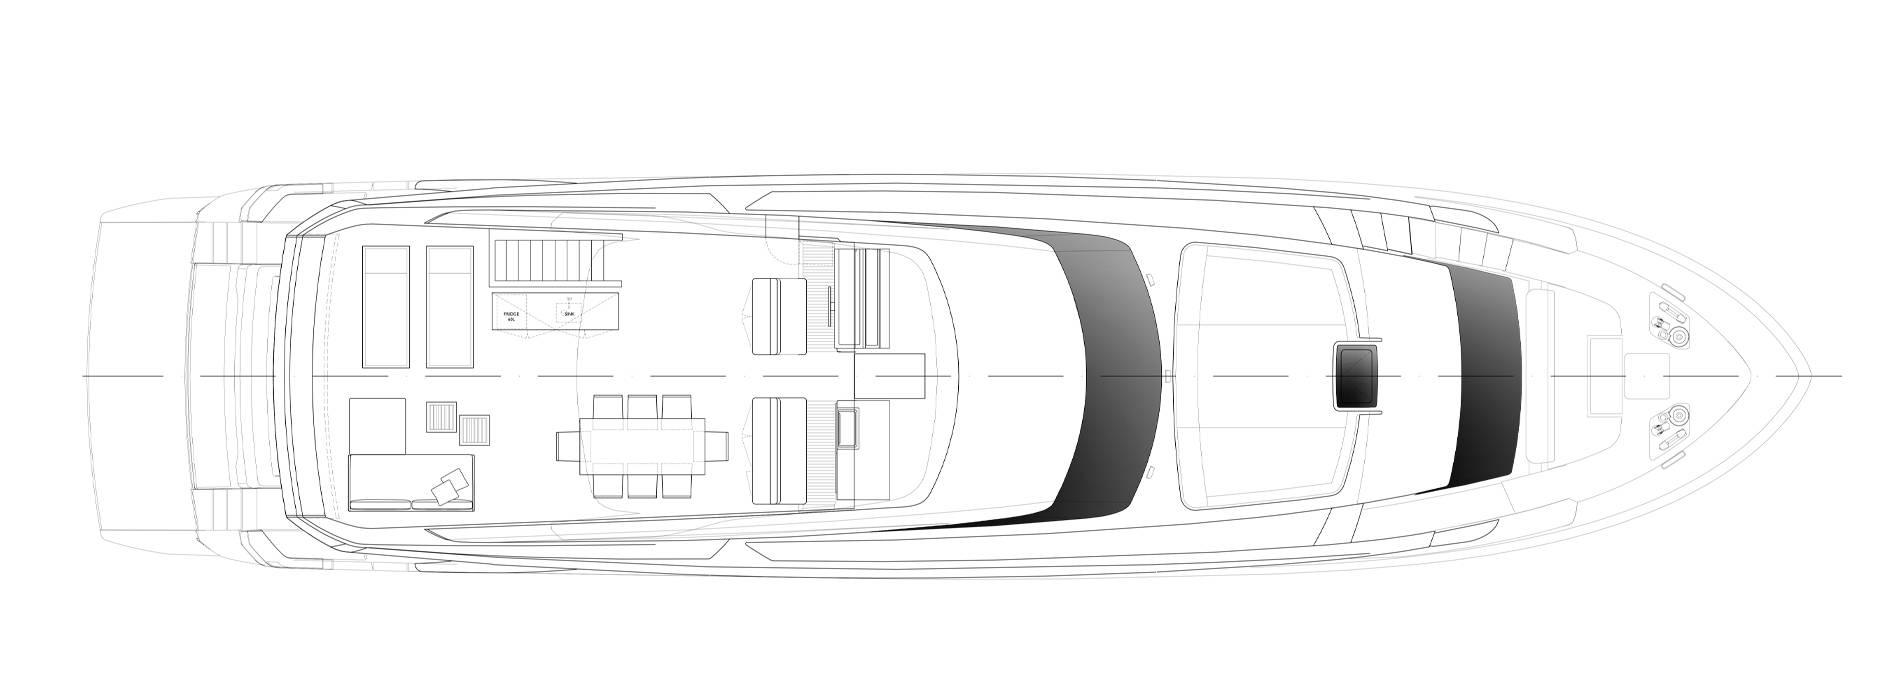 Sanlorenzo Yachts SL90 Asymmetric 飞桥